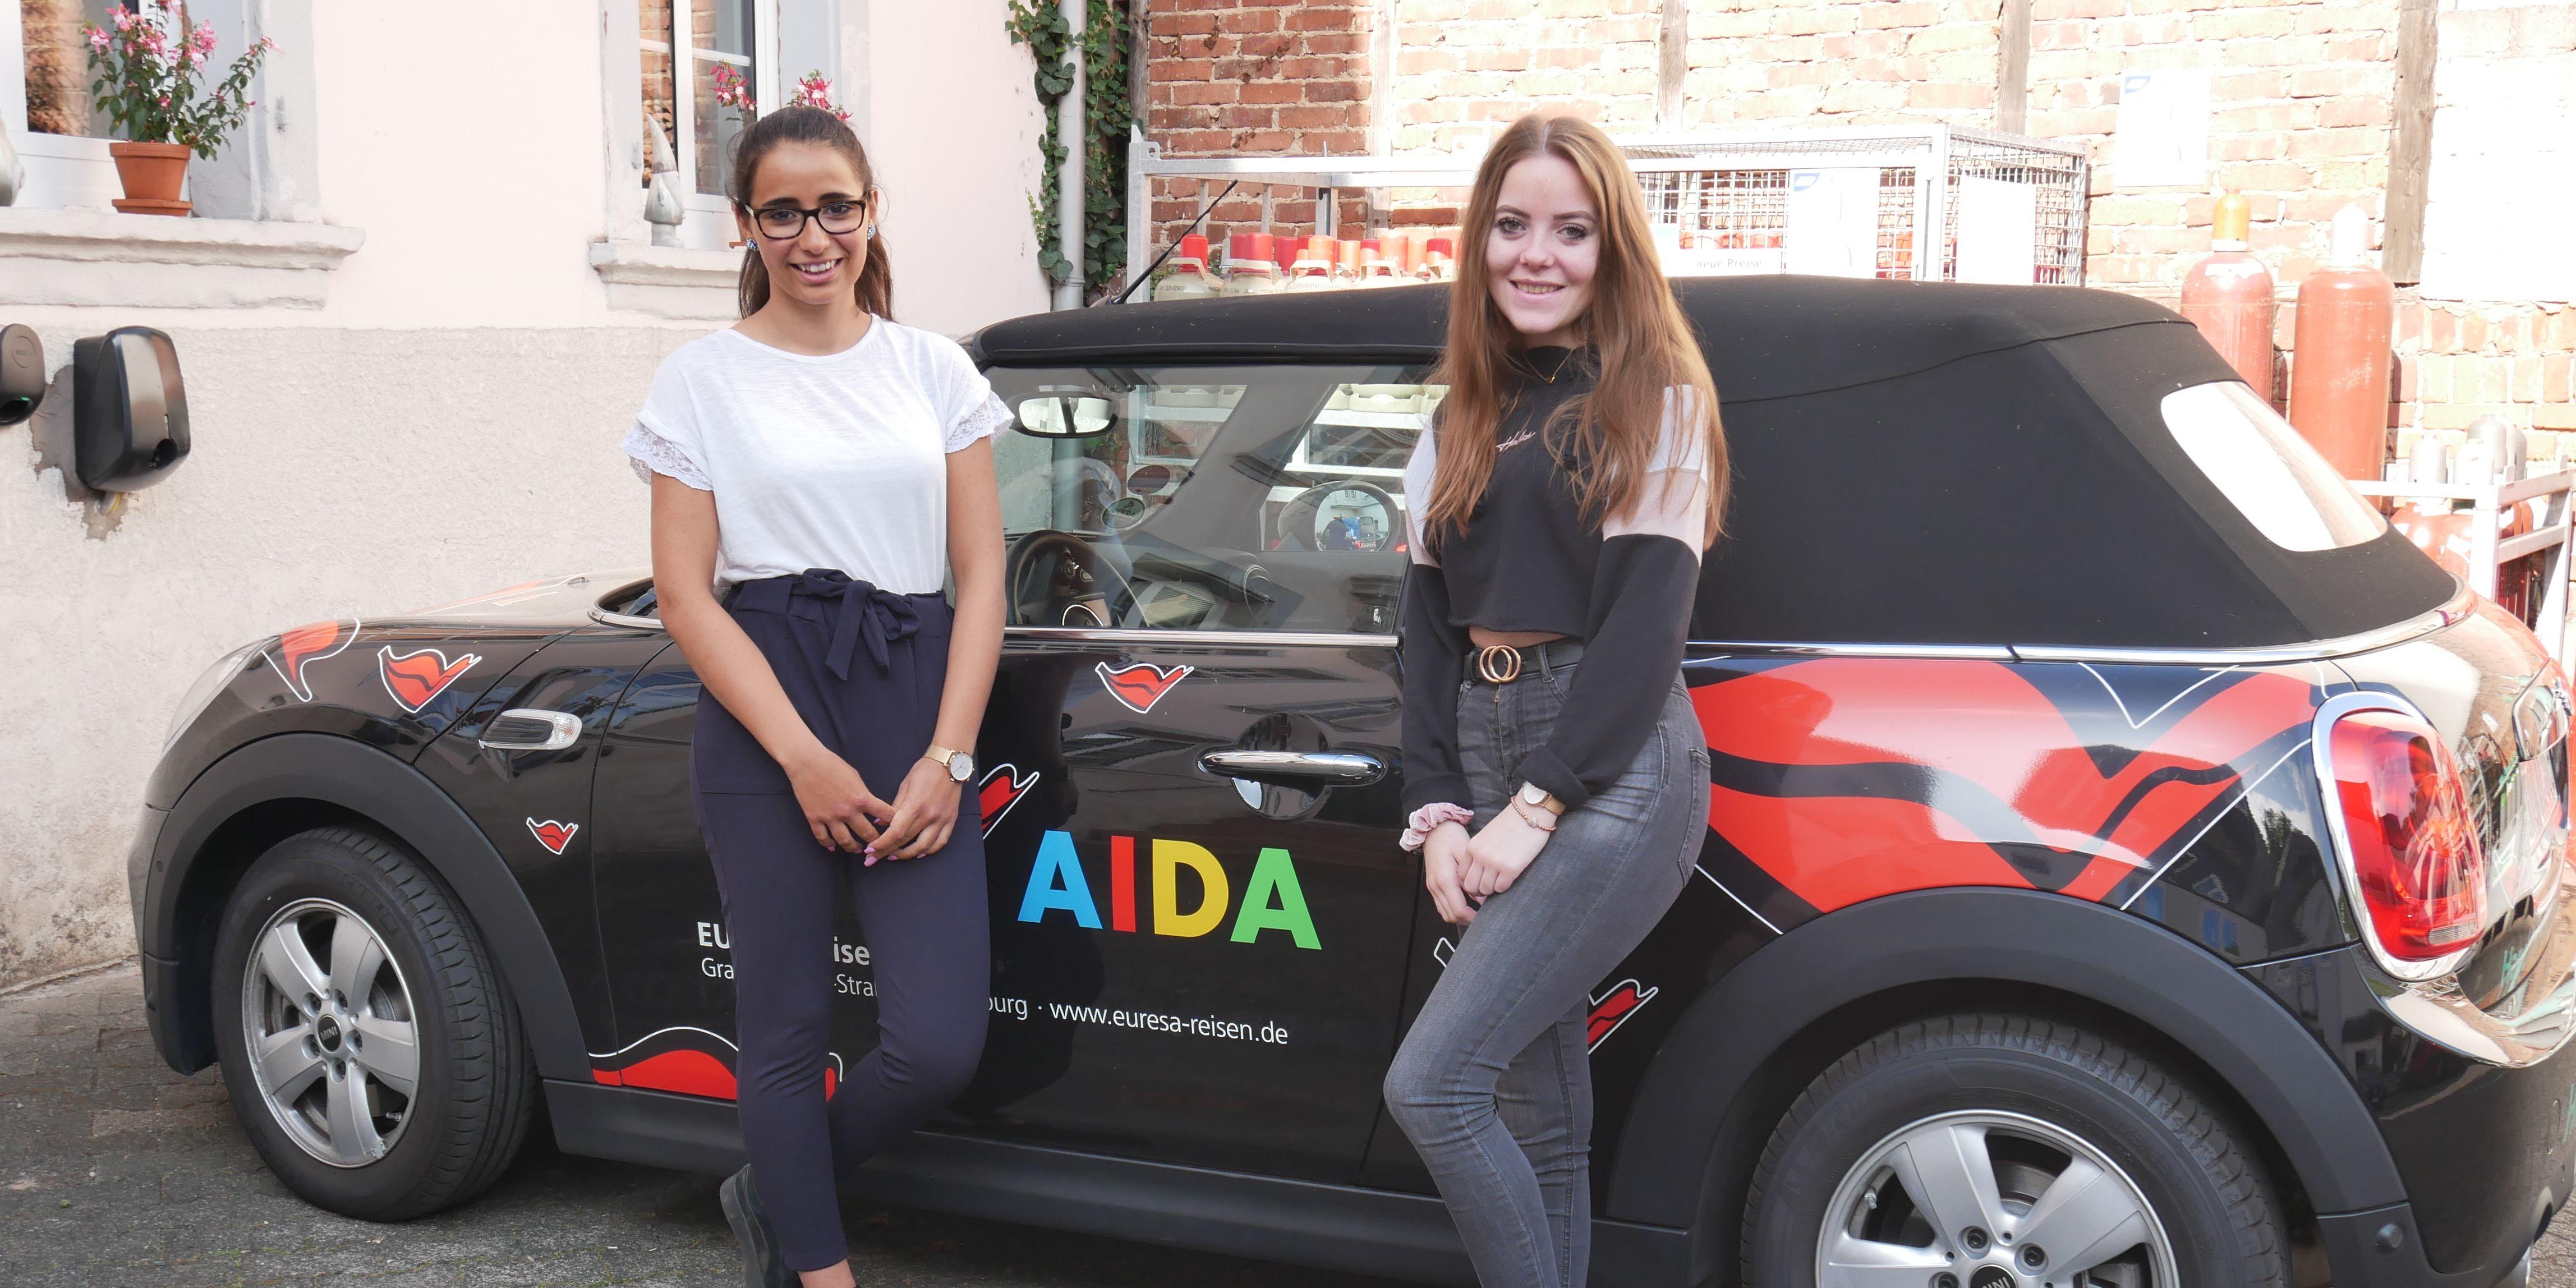 Aicha und Svenja vor Auto